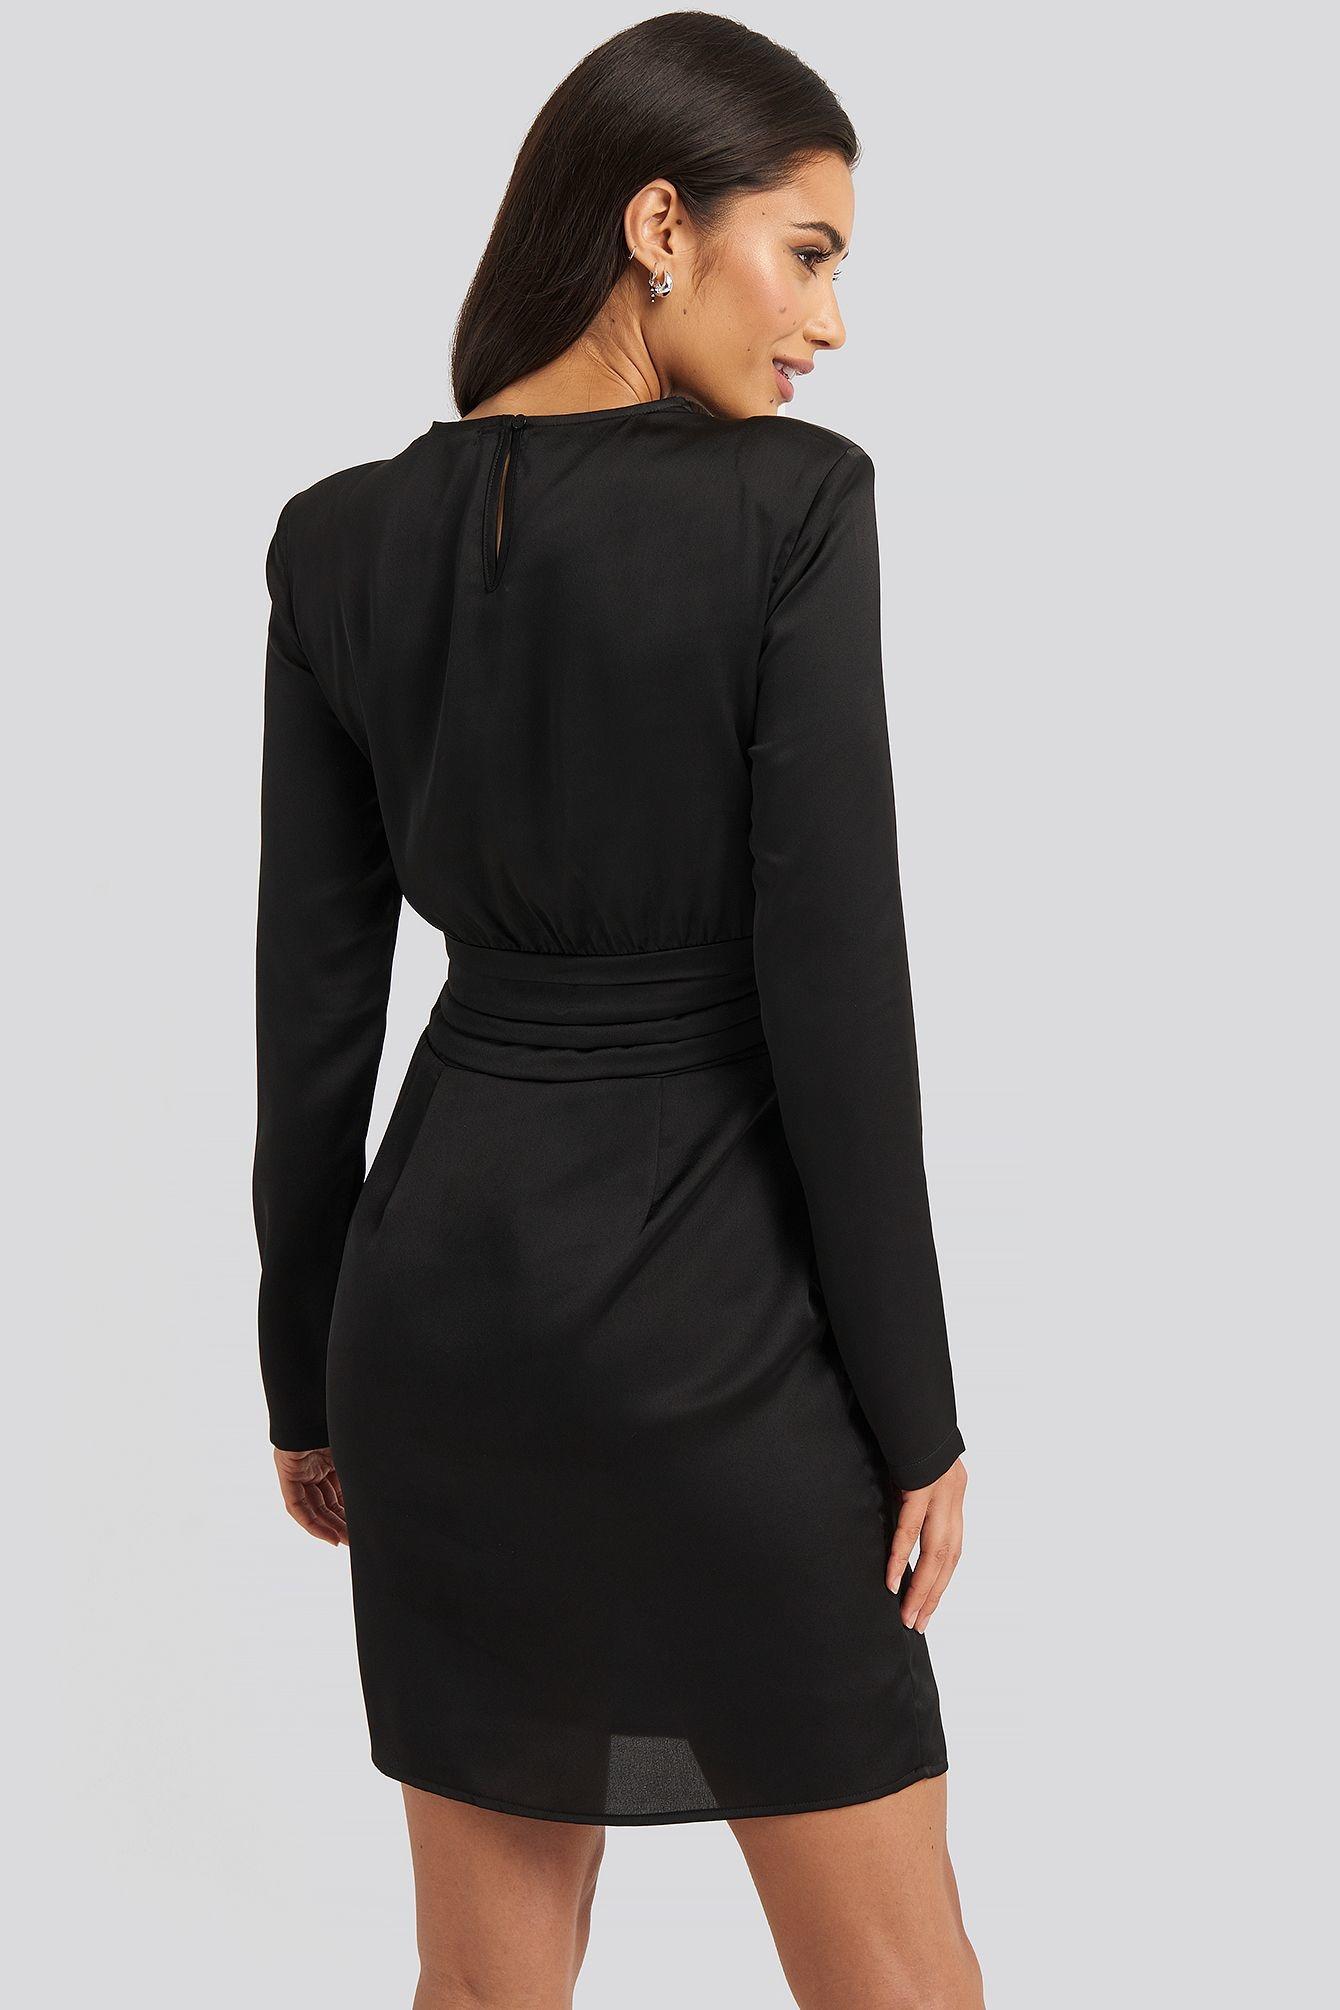 NA-KD NA-KD Padded Shoulder Overlap Mini Dress Black